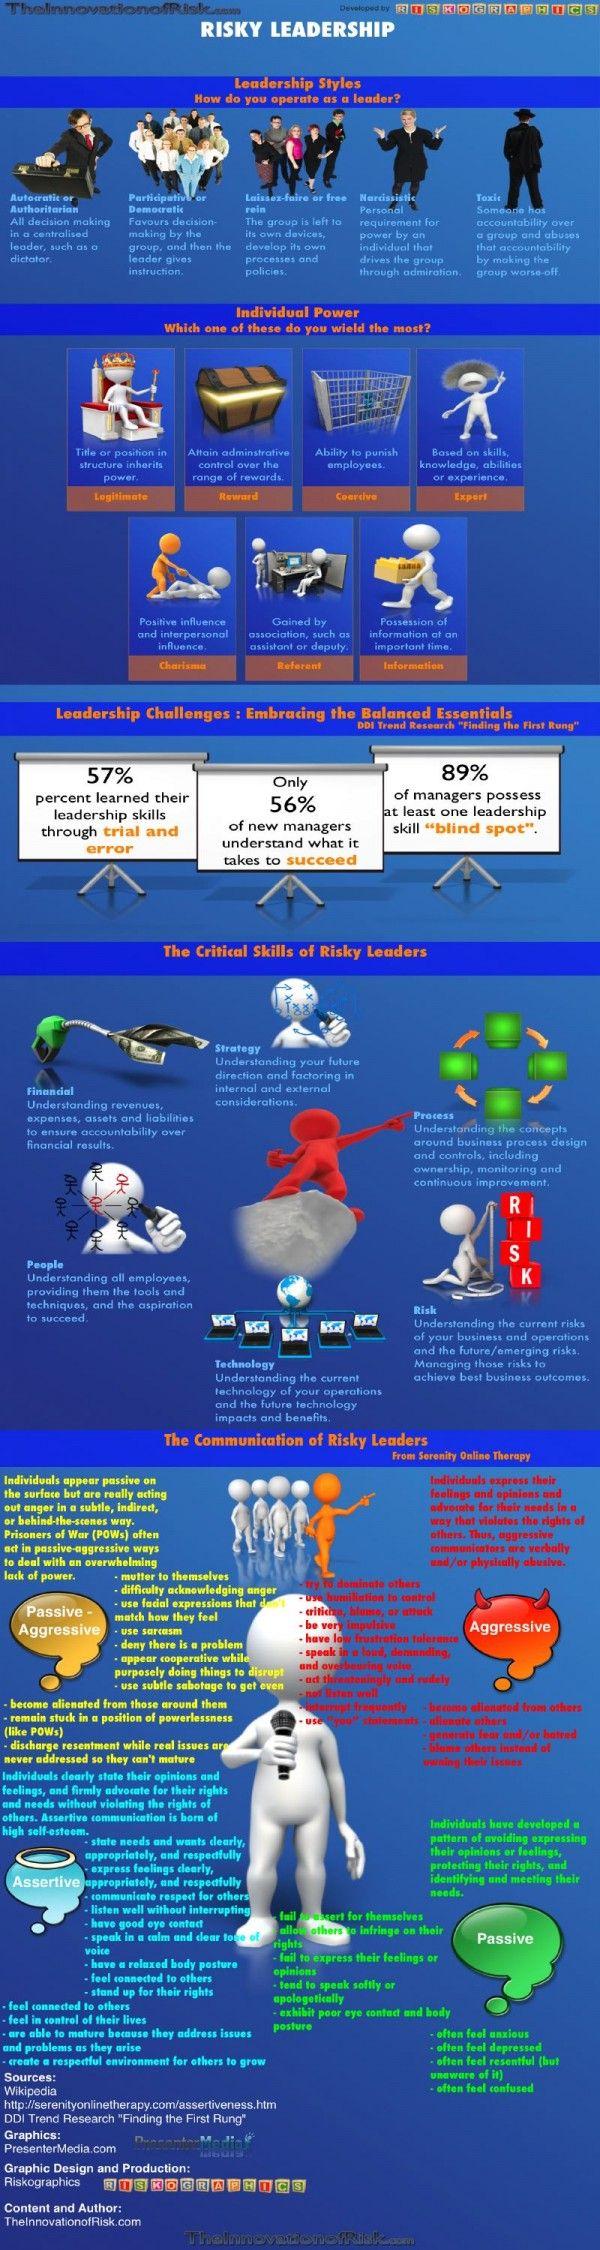 Risky Leadership Infographic | #leadership